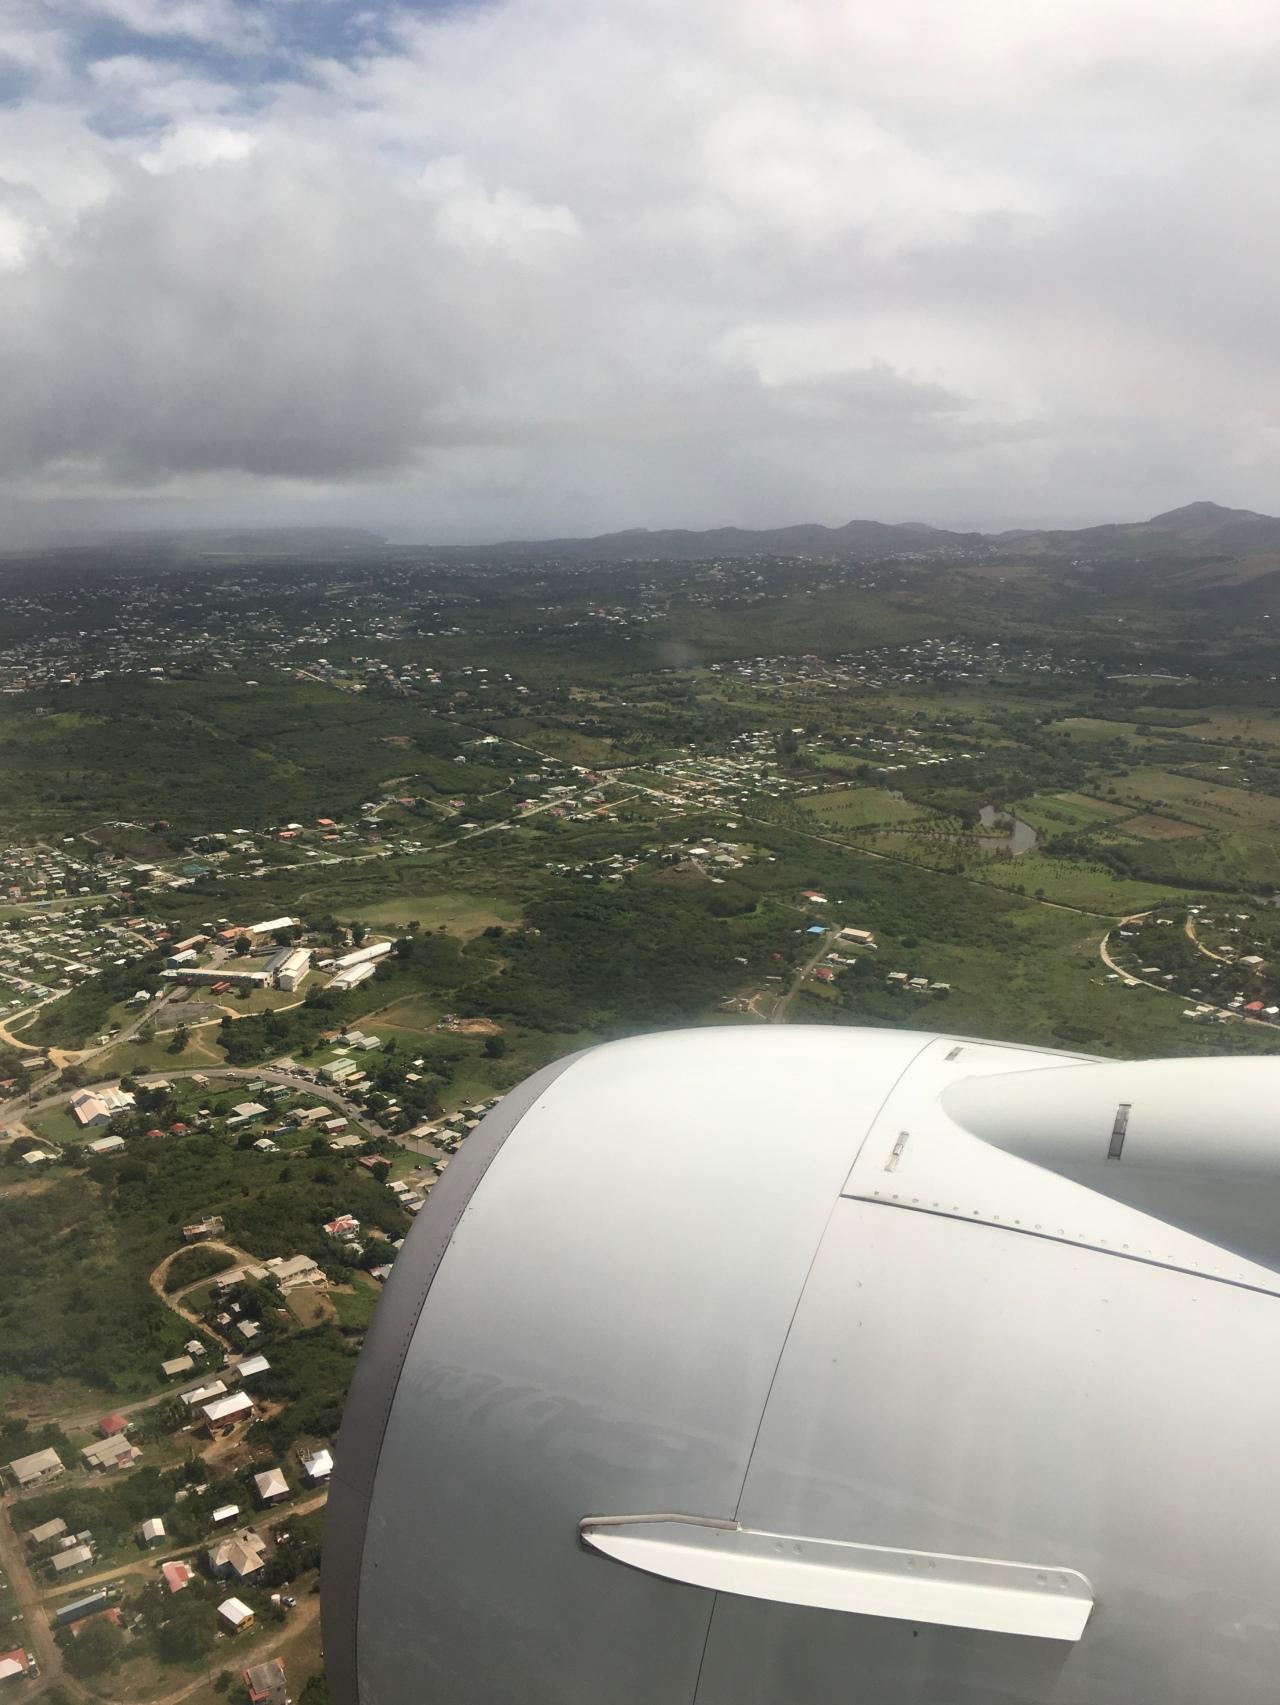 Getting to Antigua